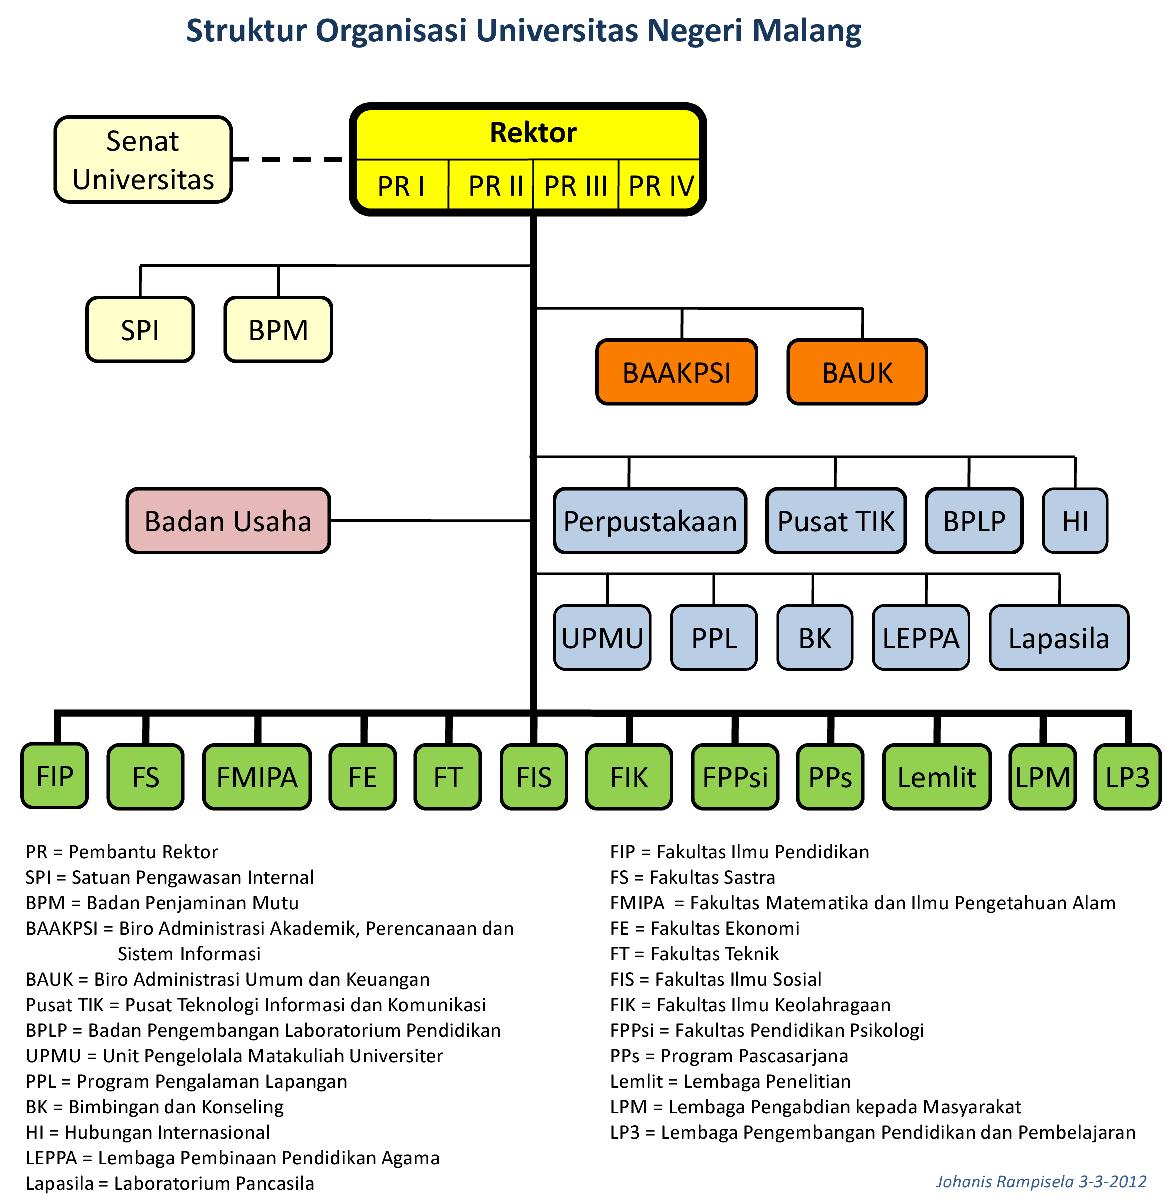 struktur organisasi universitas negeri malang berkarya dan terus Bagan Organisasi Pt. Ifatama Jaya Kreasi harap